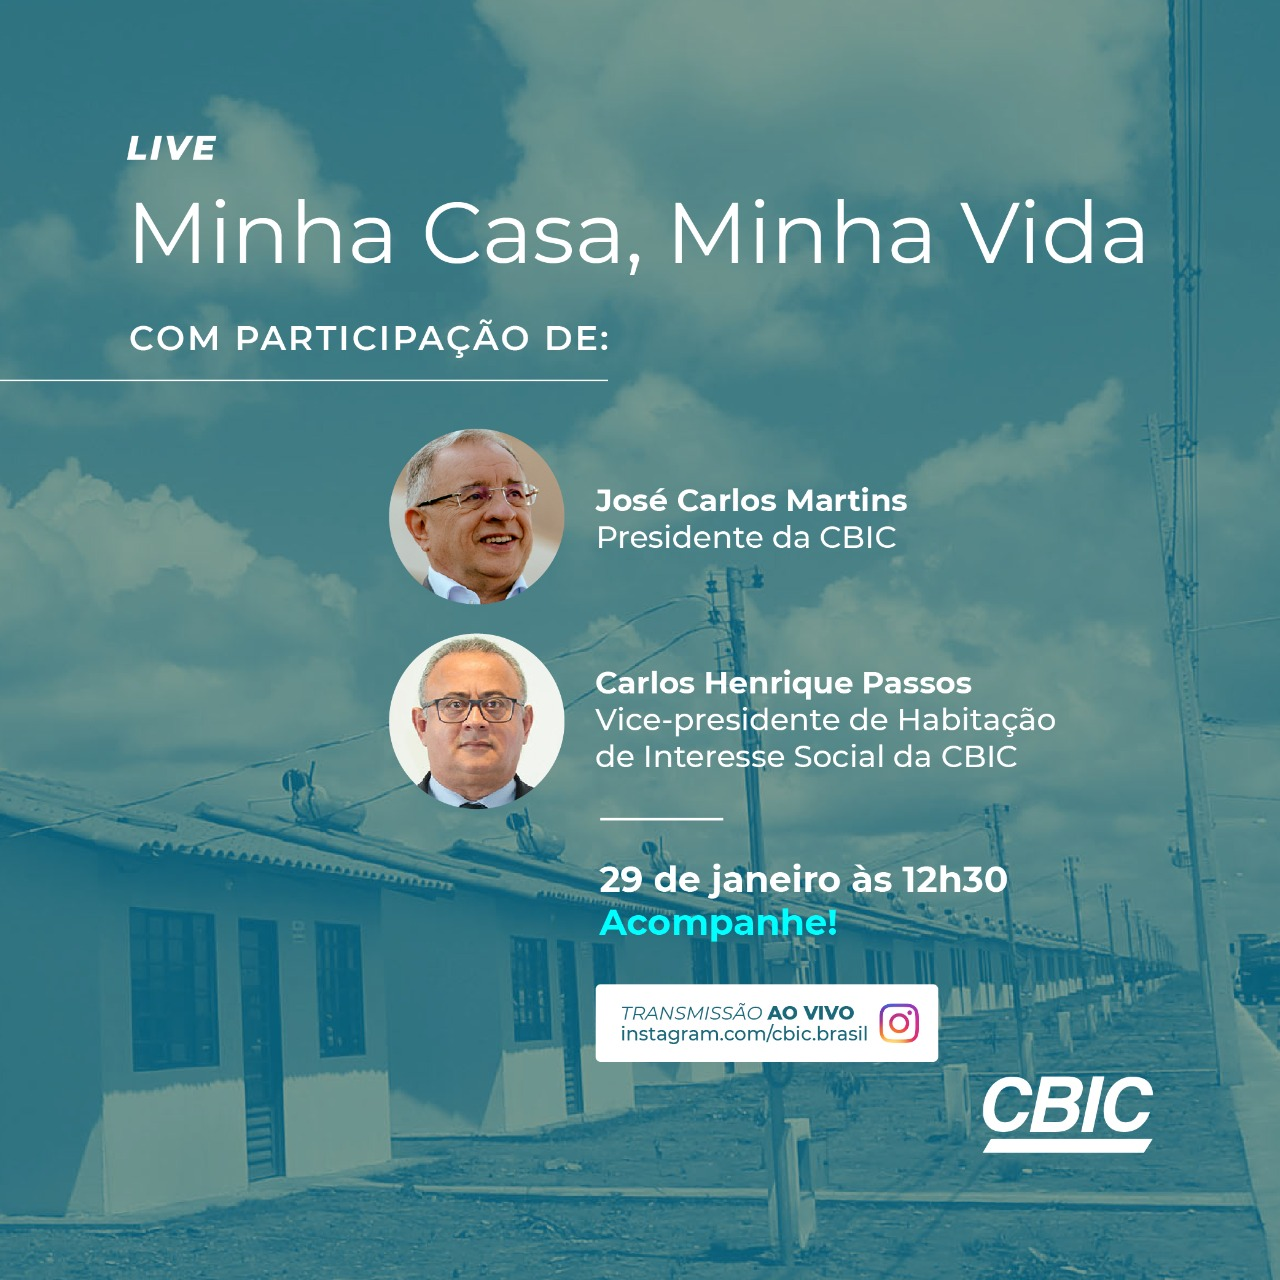 Live CBIC MCMV